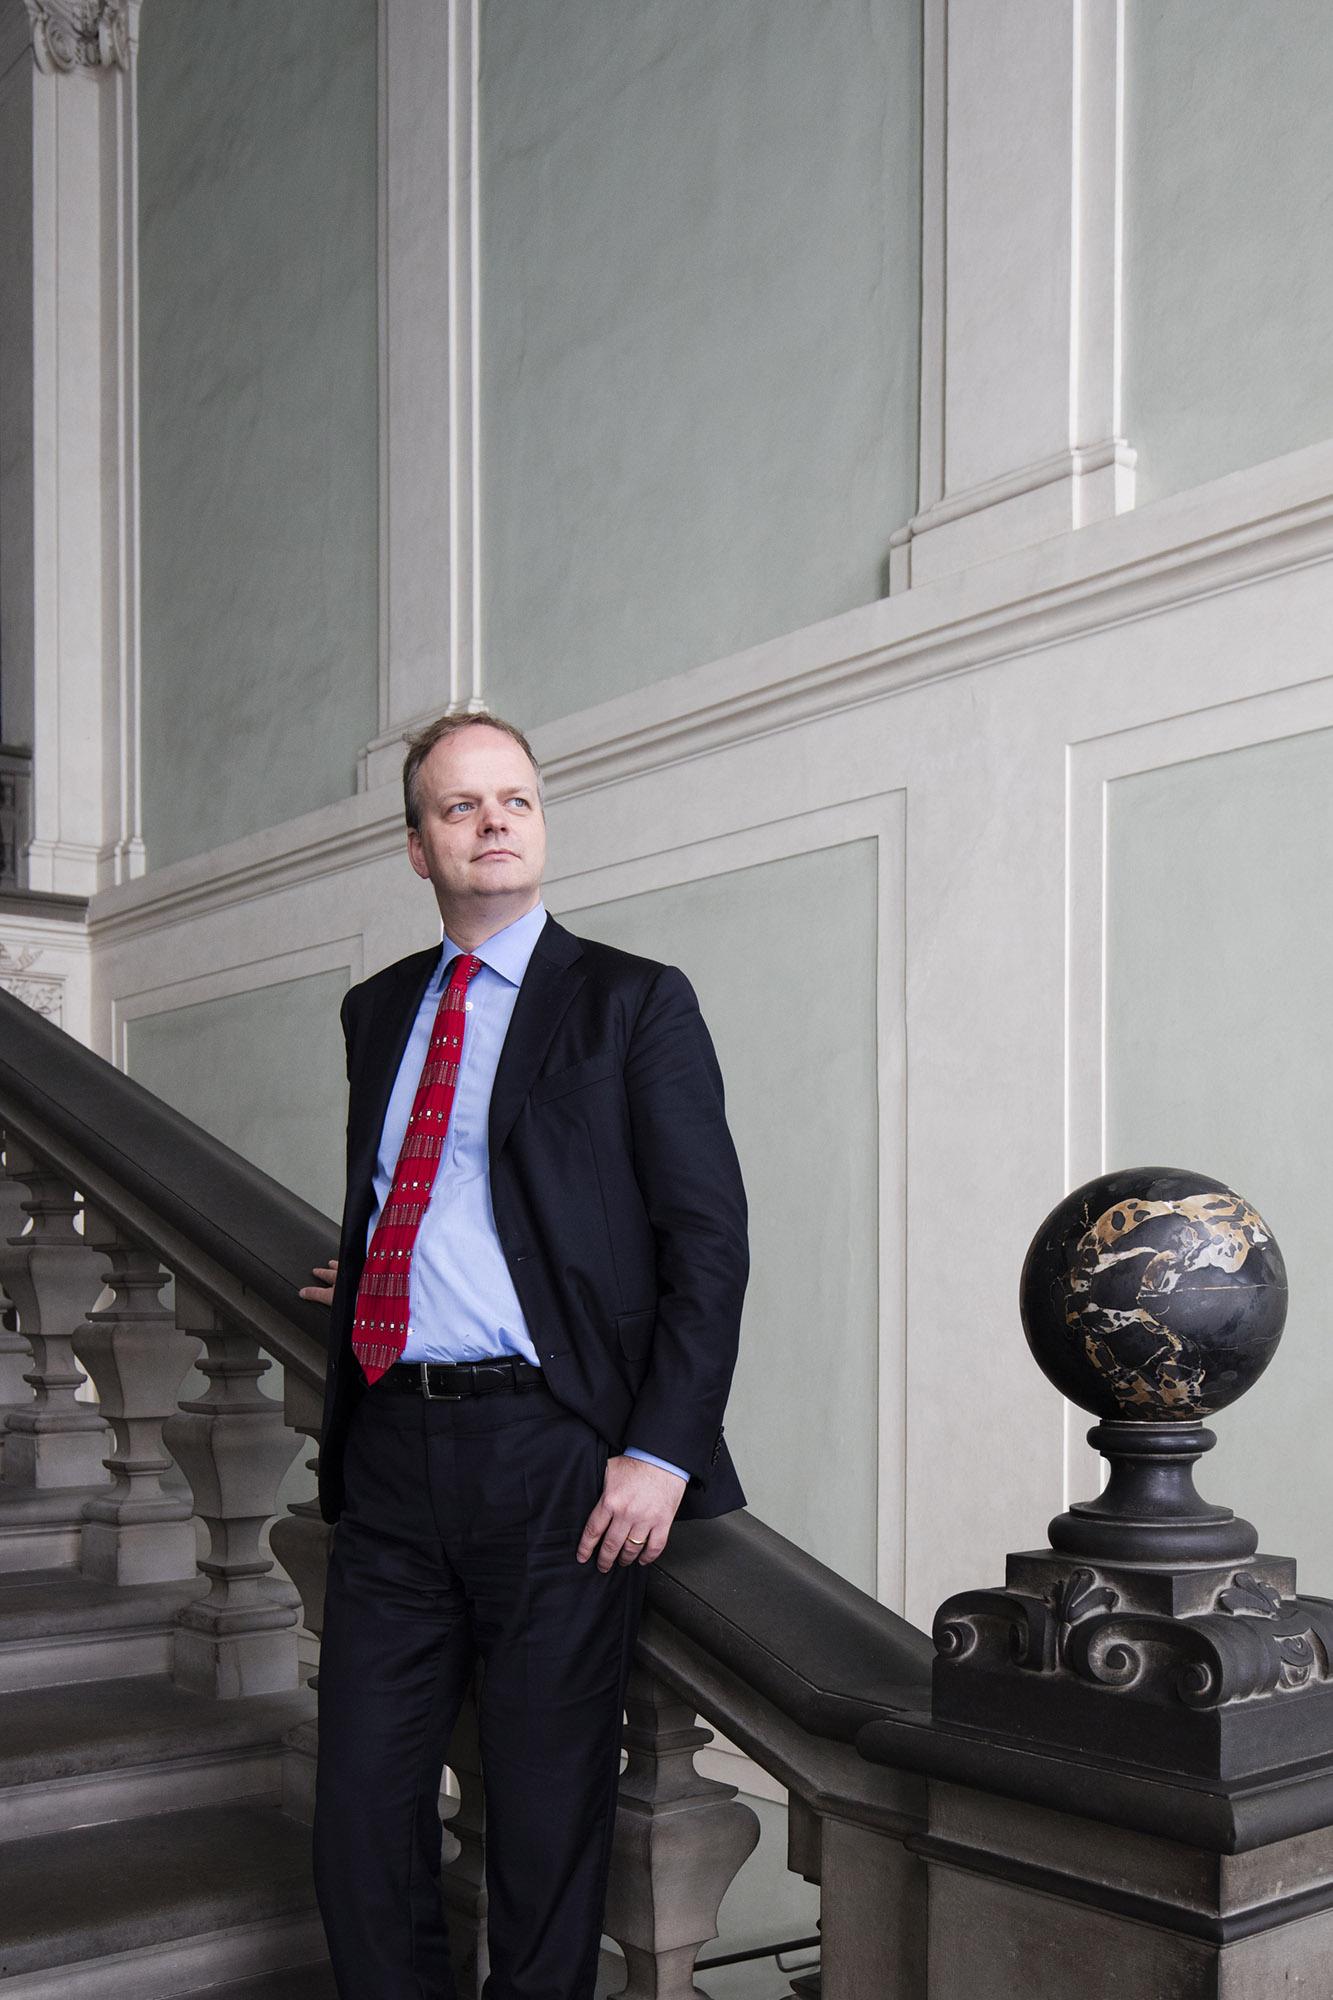 Eike Schmidt , Director of Uffizi Gallery